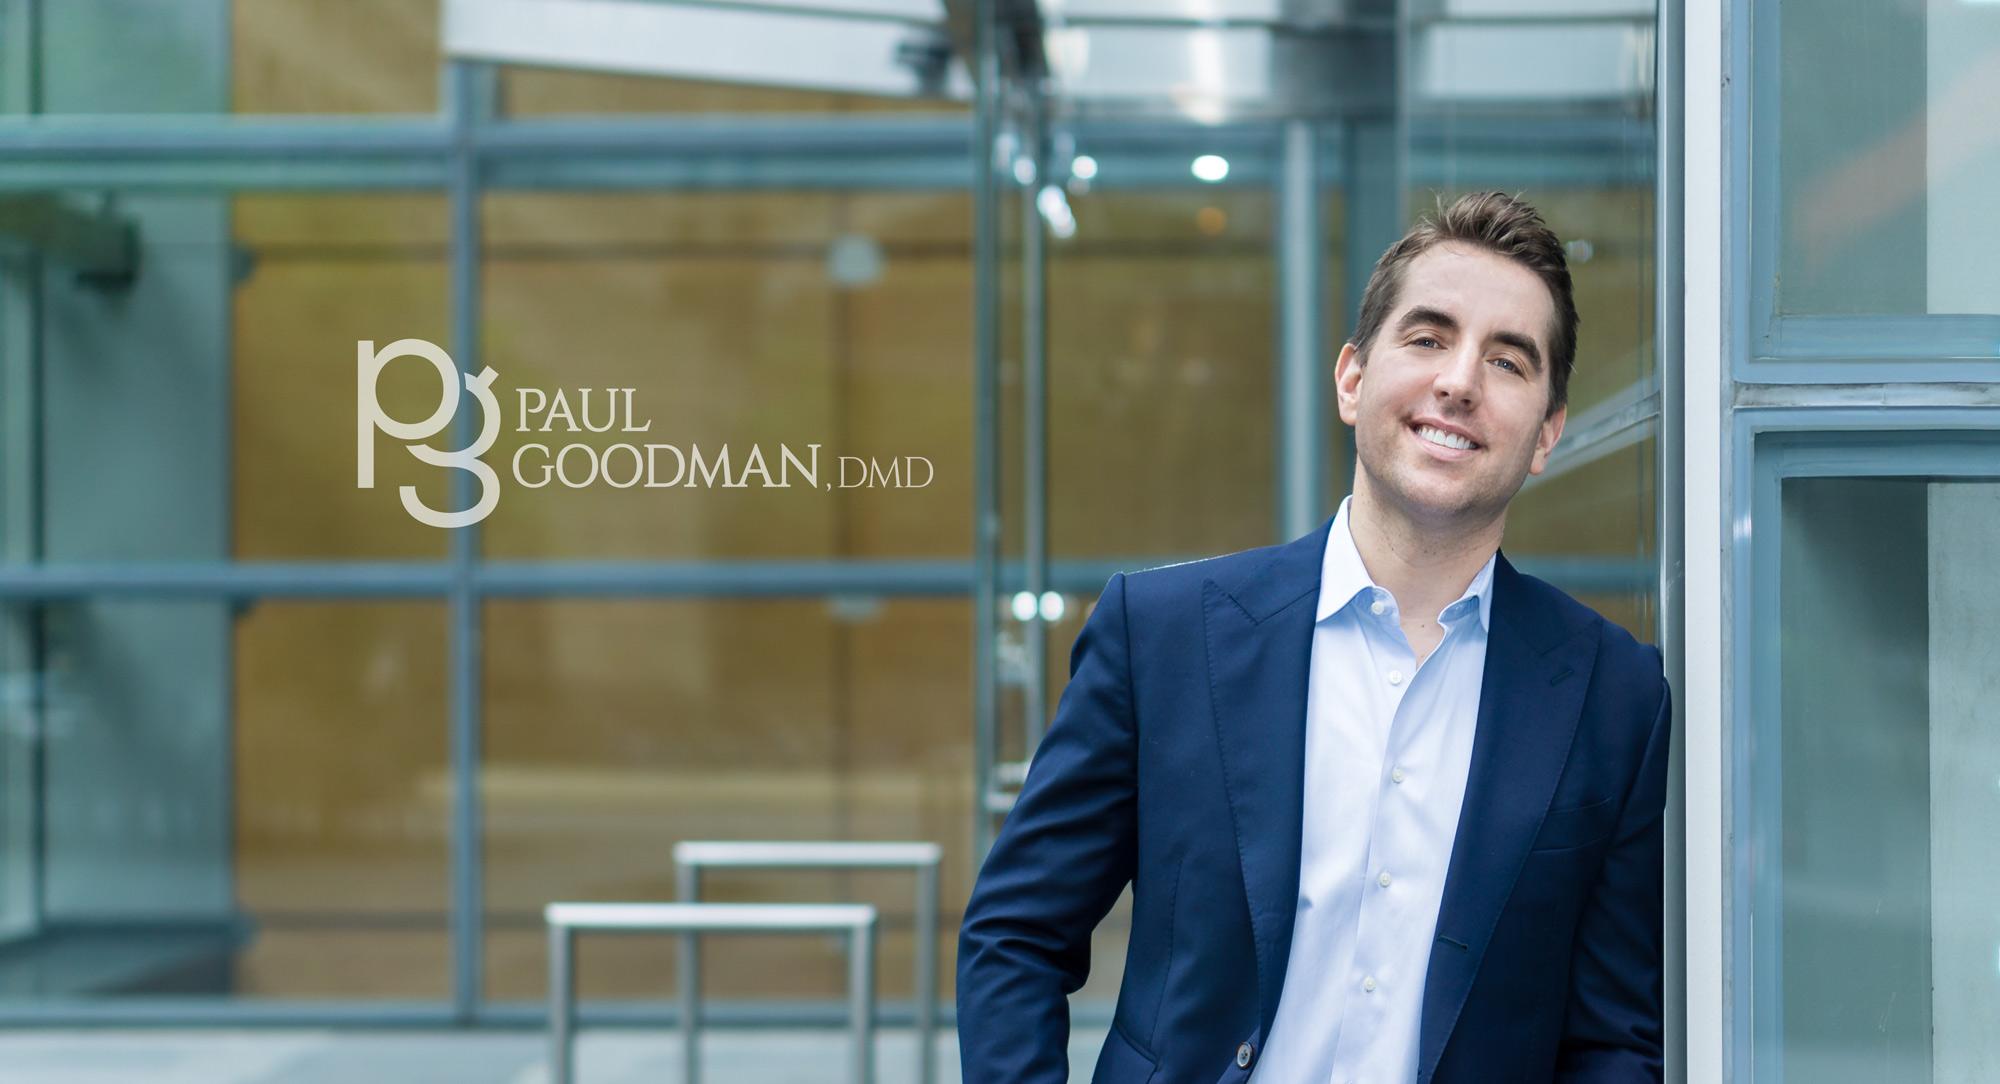 Dr. Paul Goodman